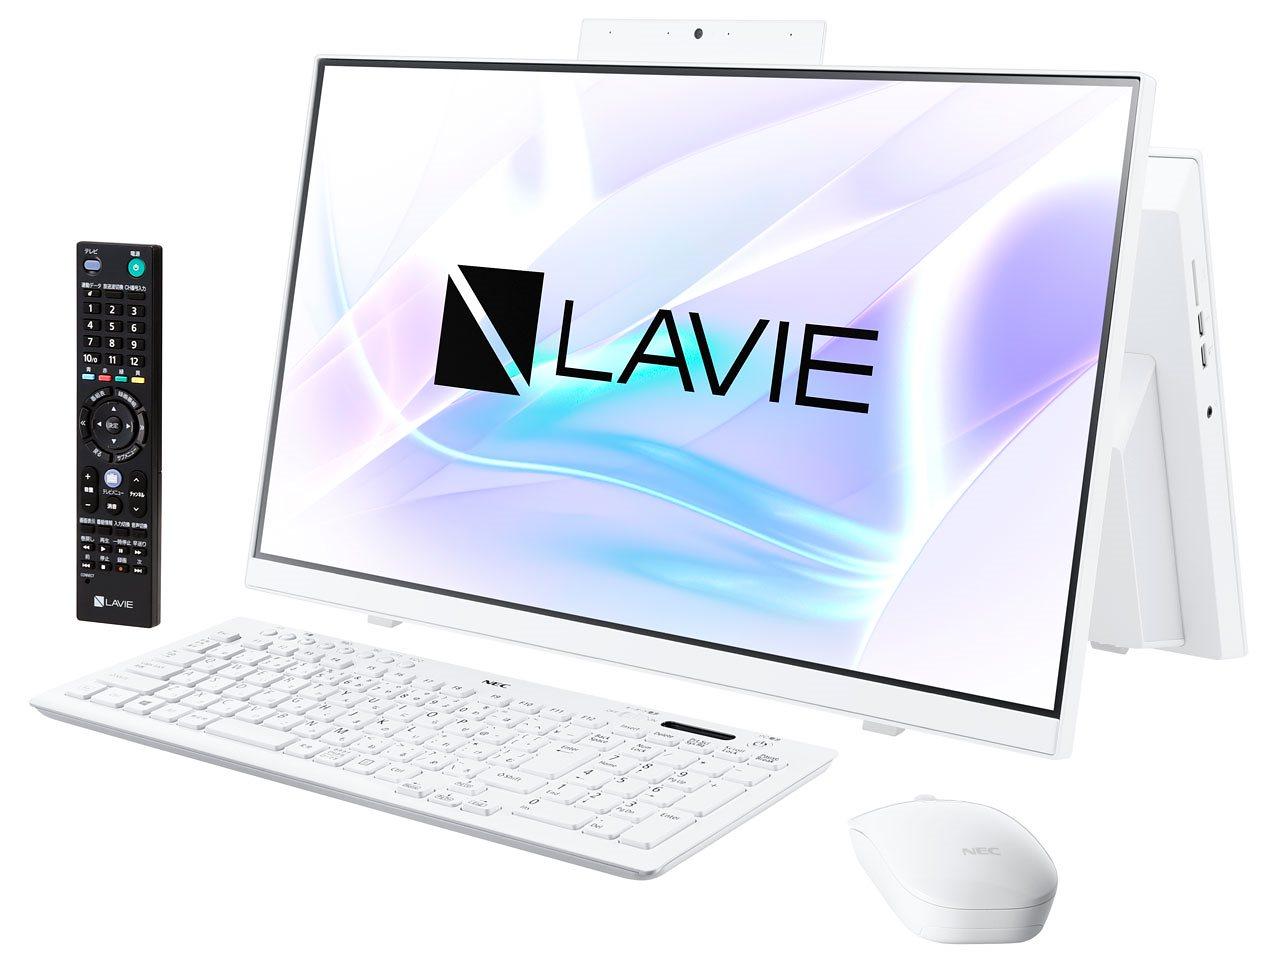 NEC LAVIE Home All-in-one HA370/RAW PC-HA370RAW [ファインホワイト]23.8型/Win10/Celeron 5205U/8GB/1TB/